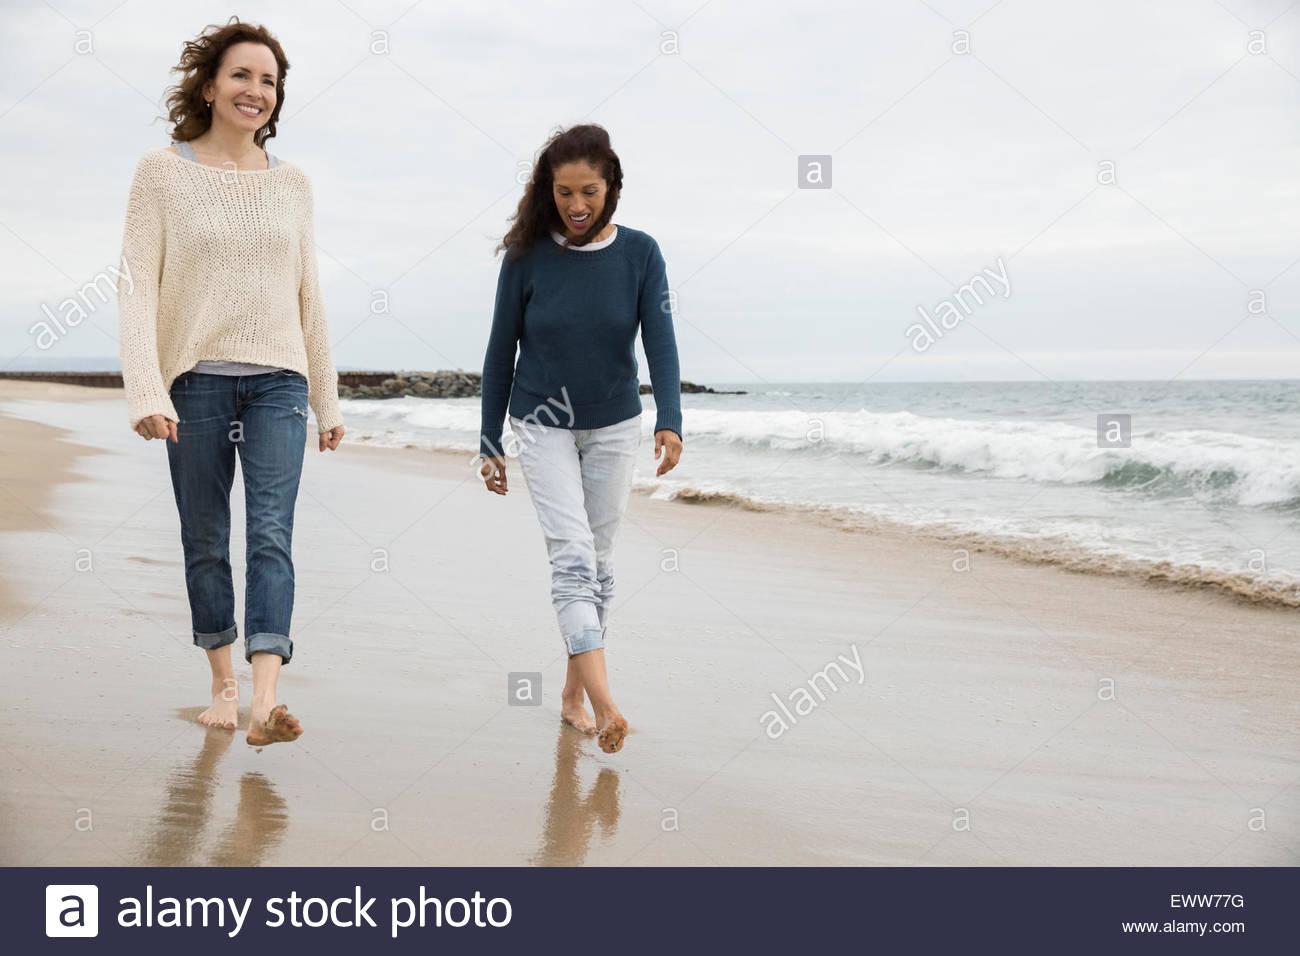 Women walking on beach - Stock Image